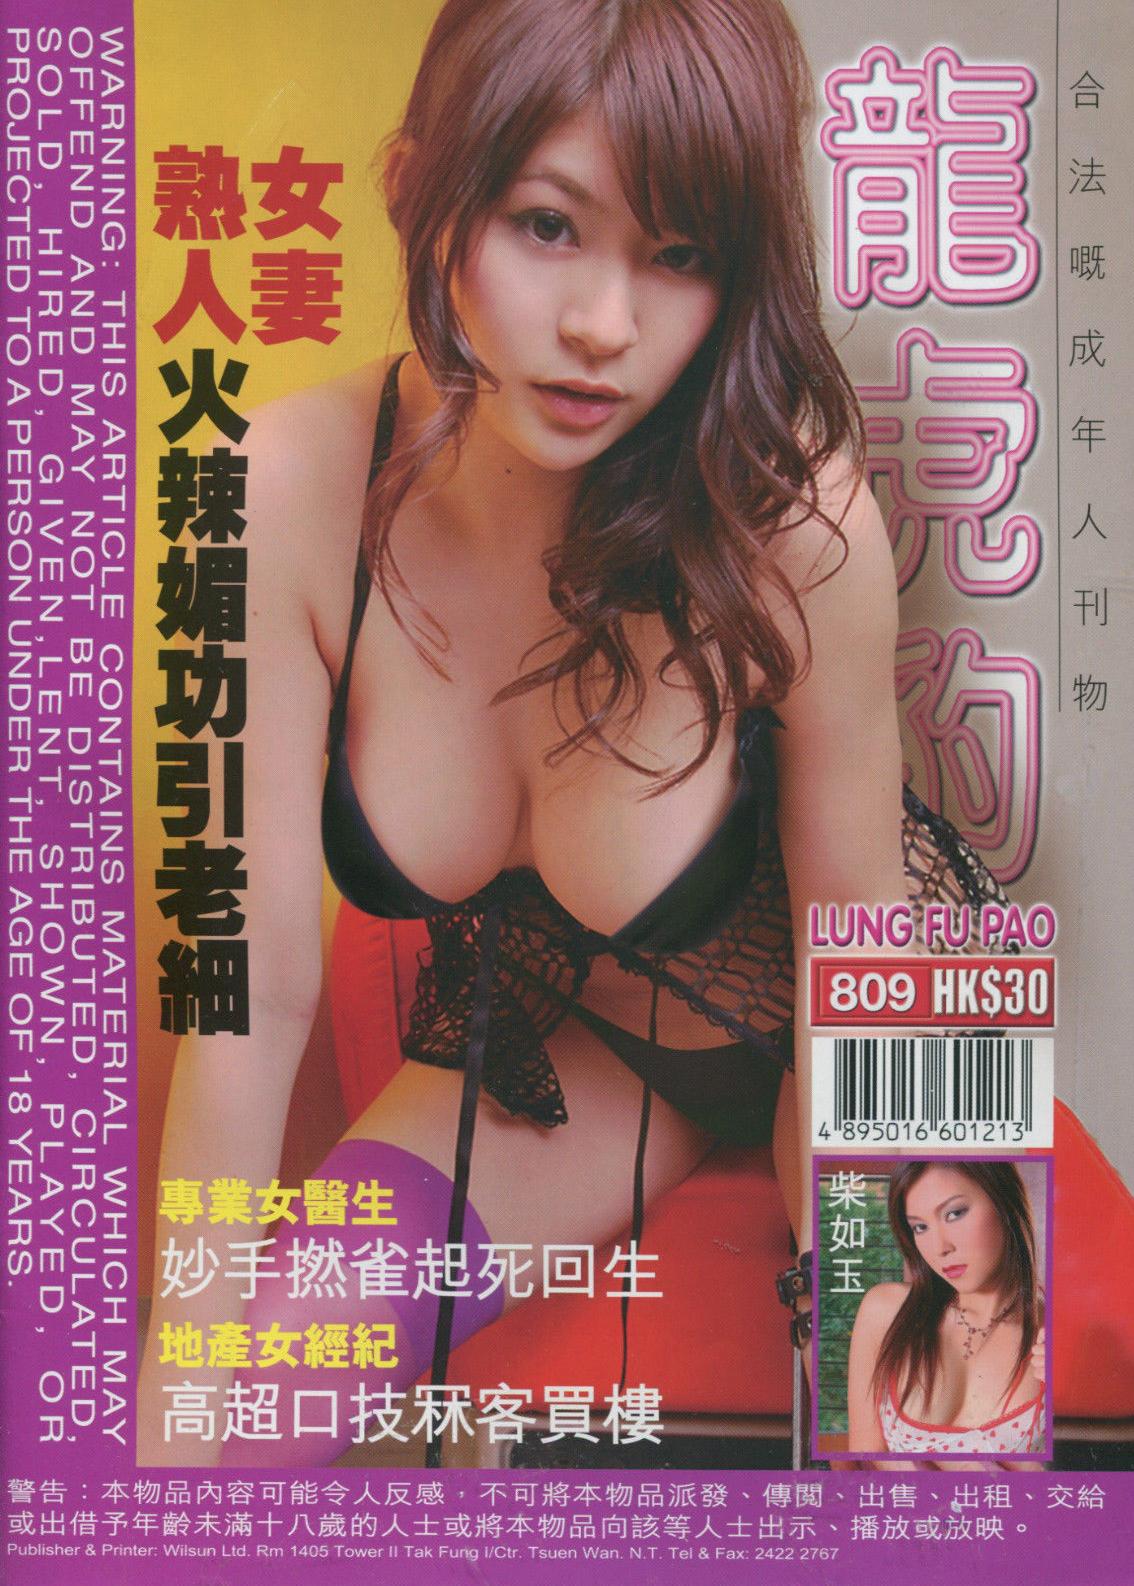 Lung Fu Pao # 809 magazine back issue Lung Fu Pao magizine back copy